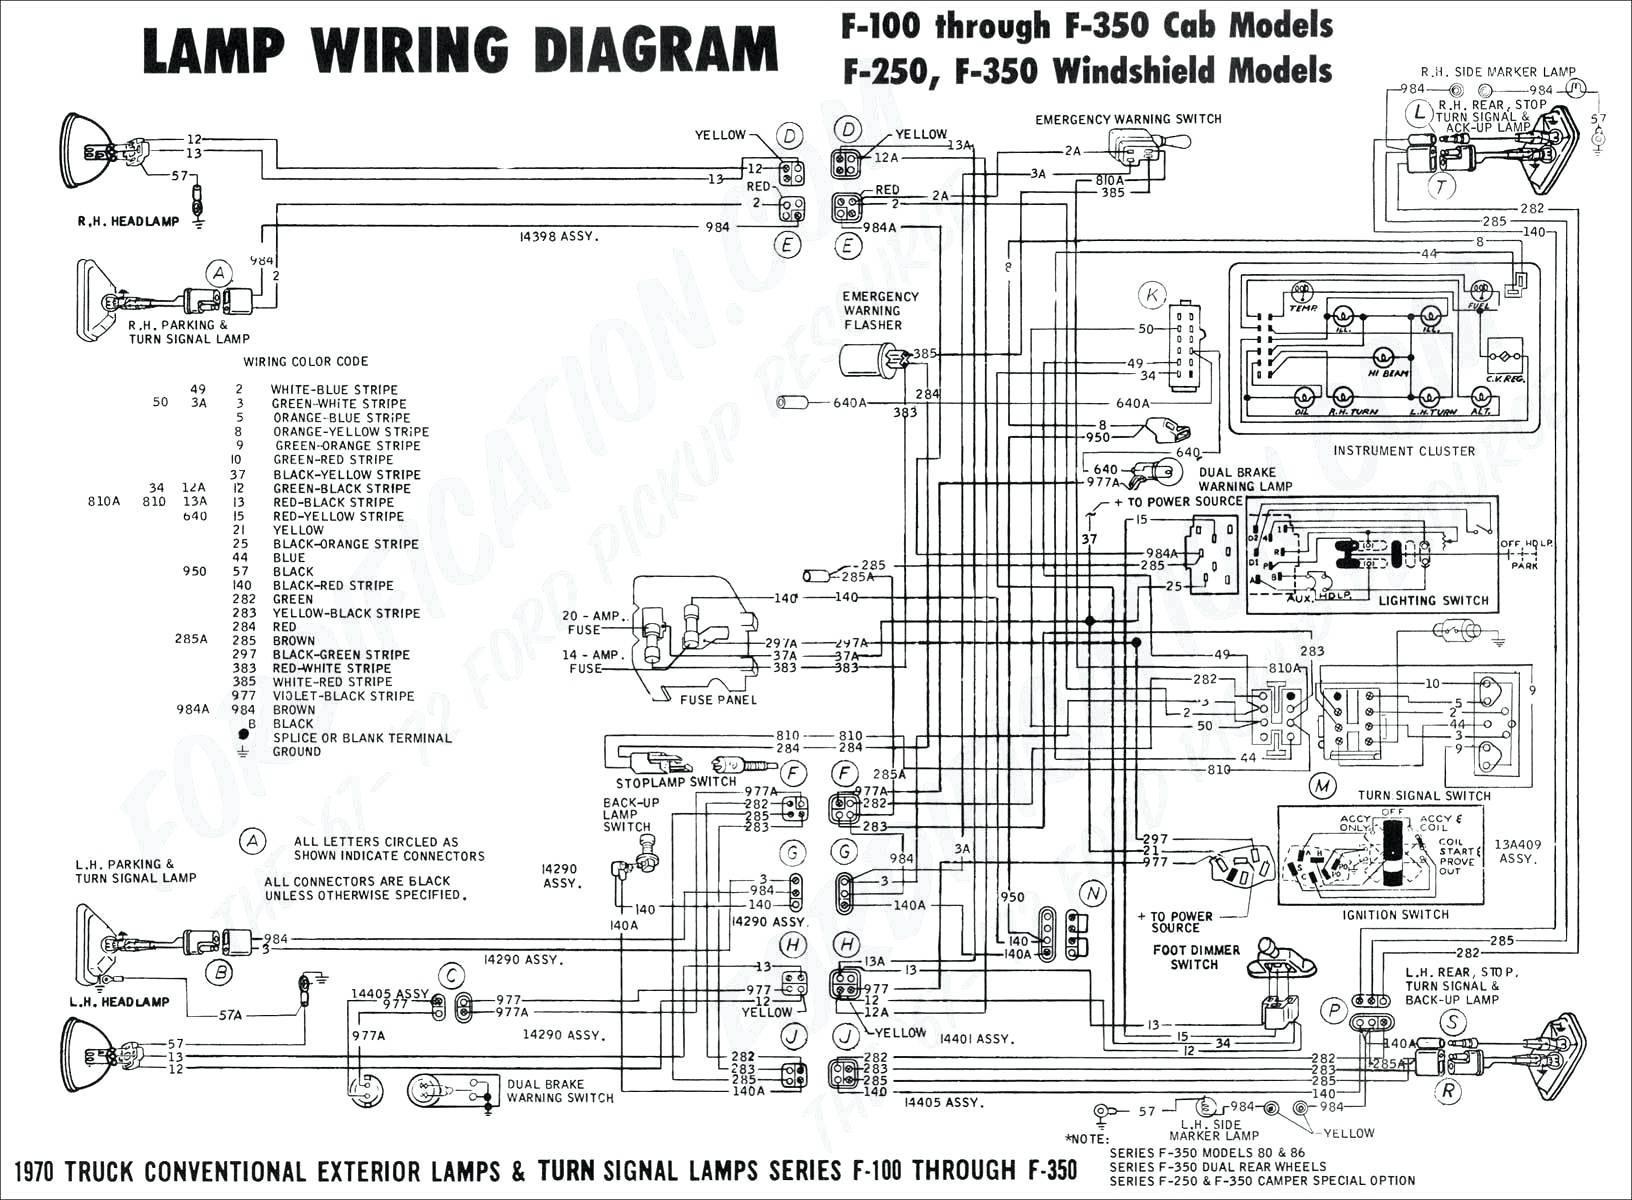 2000 Honda Accord Wiring Diagram Golf 4 O2 Sensor Wiring Diagram New 2000 Honda Accord O2 Sensor